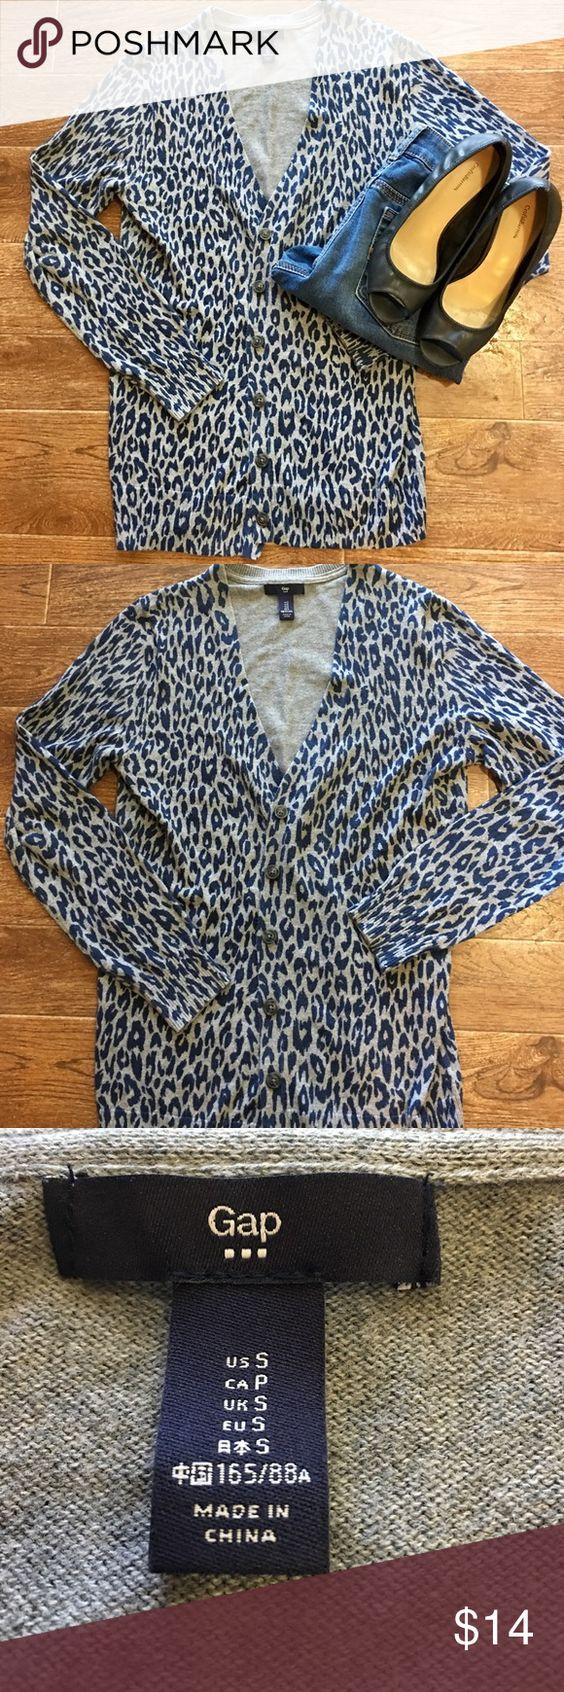 Gray and Blue Leopard Print Gap Cardigan | Blue, Leopard prints ...